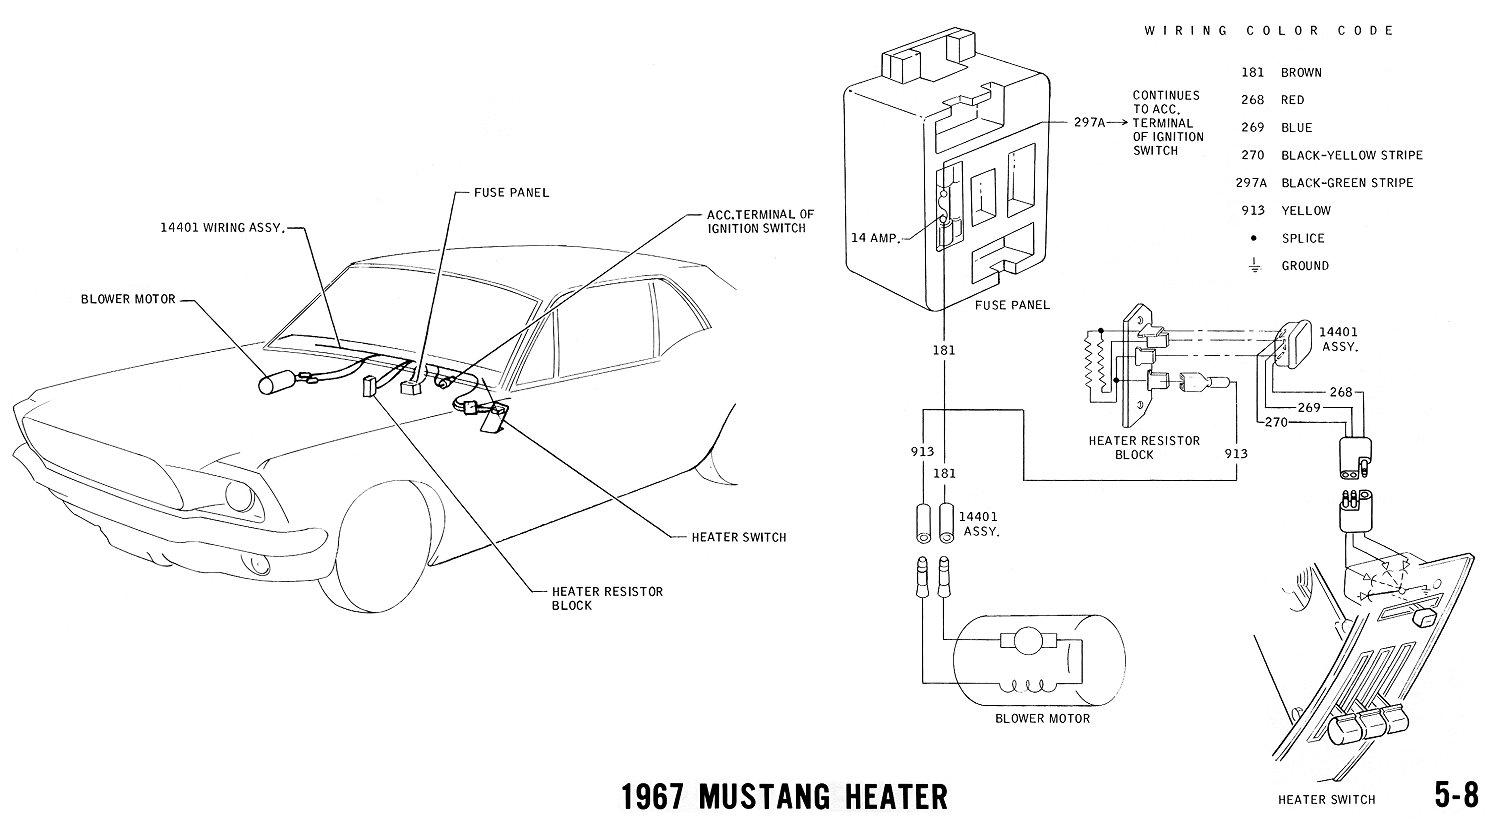 Fabulous 67 Mustang Fuse Box Wiring Diagram Data Wiring Cloud Licukshollocom